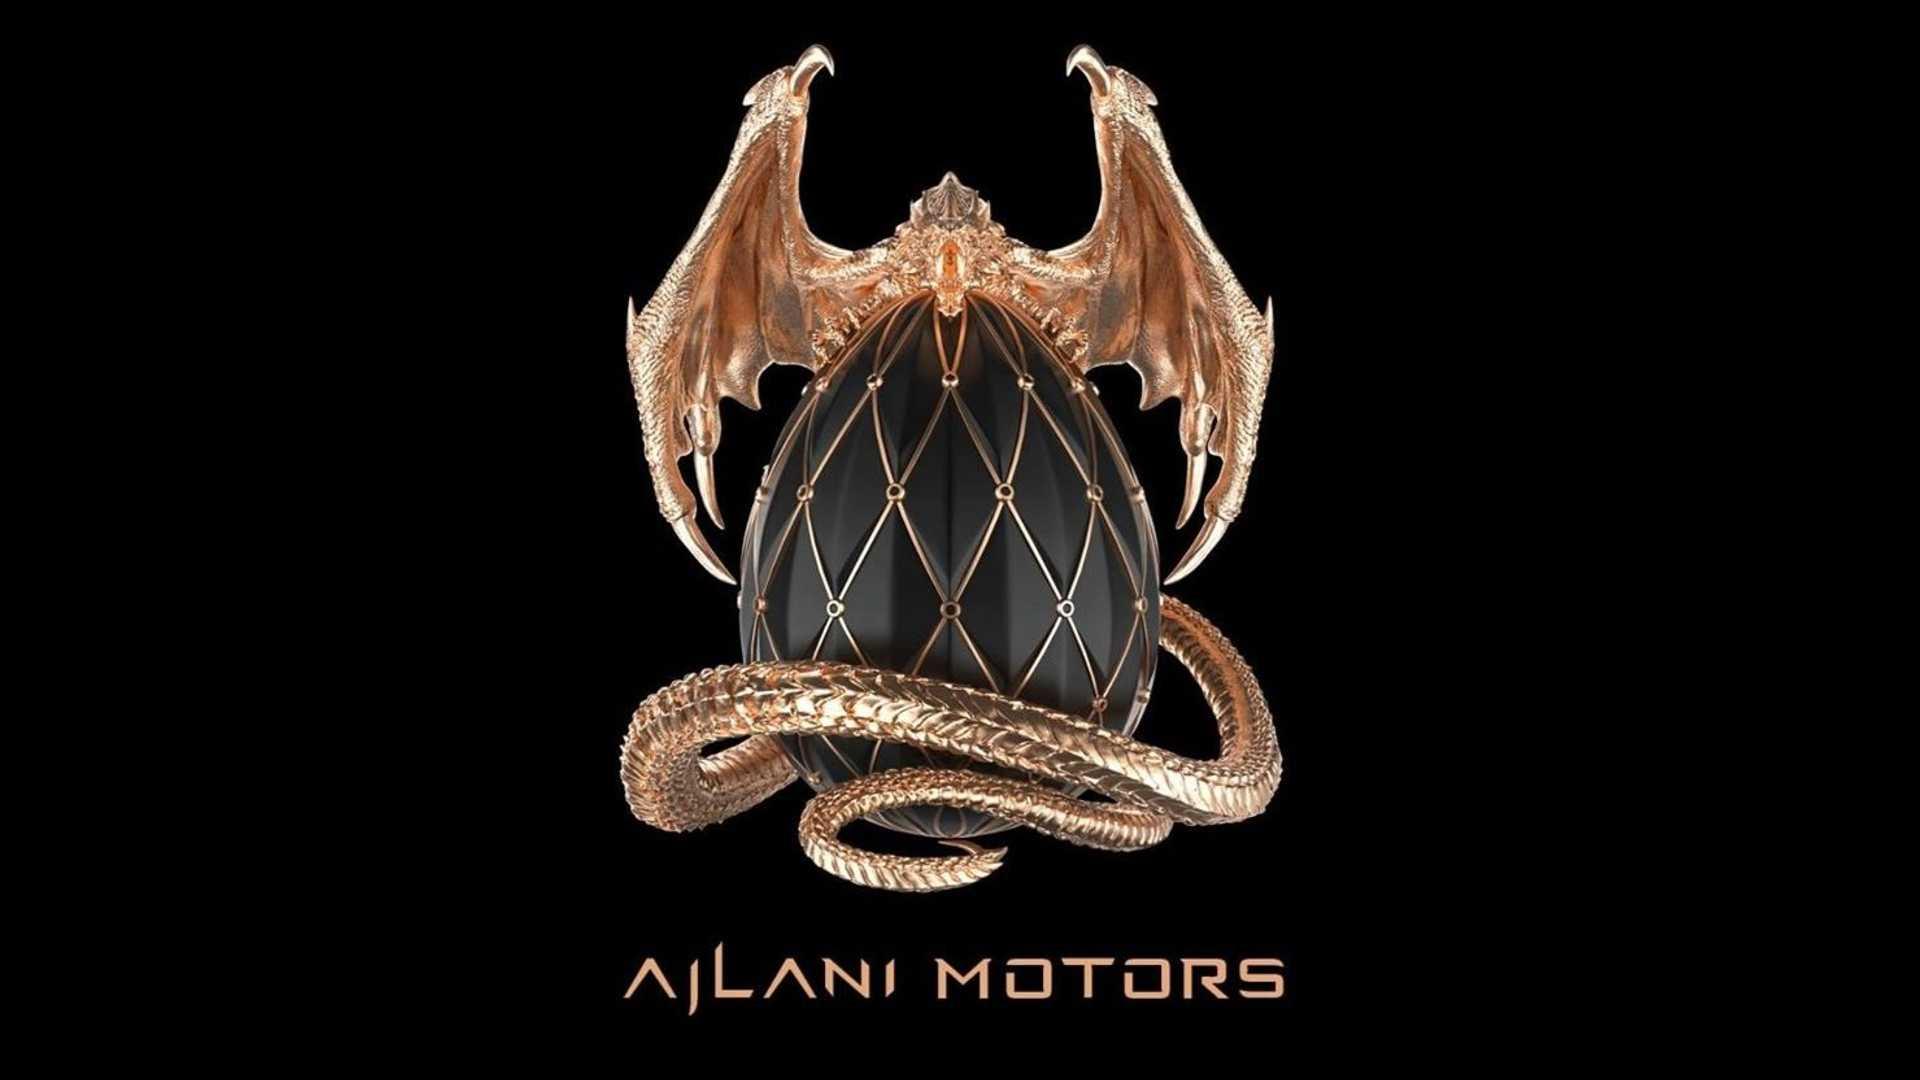 ajlani-dragon-teasers